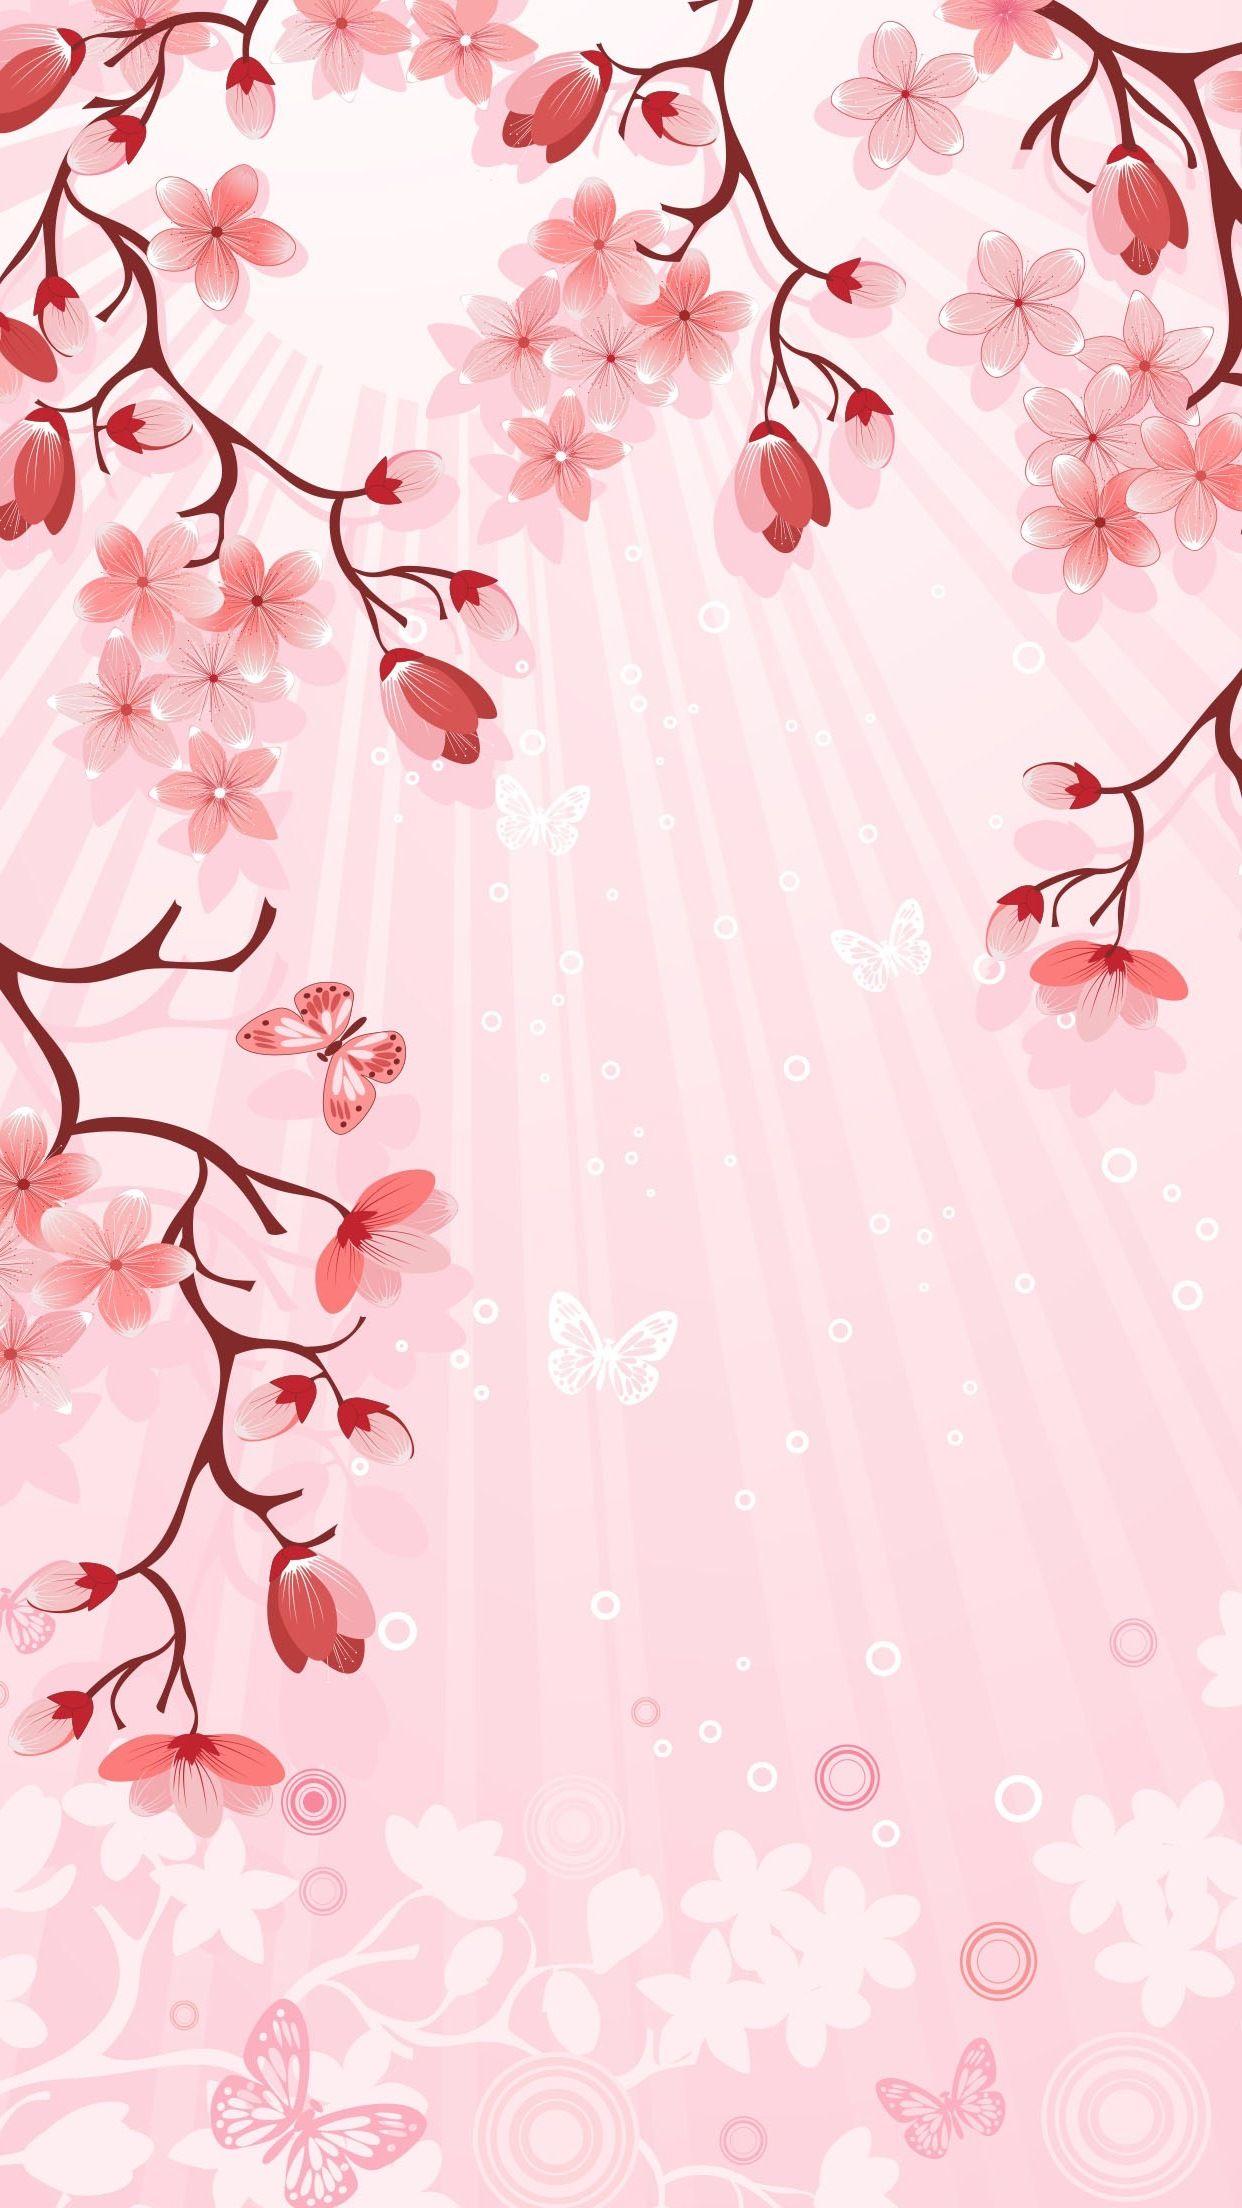 Pink Wallpaper Android พ นหล ง Pinterest Pink Wallpaper